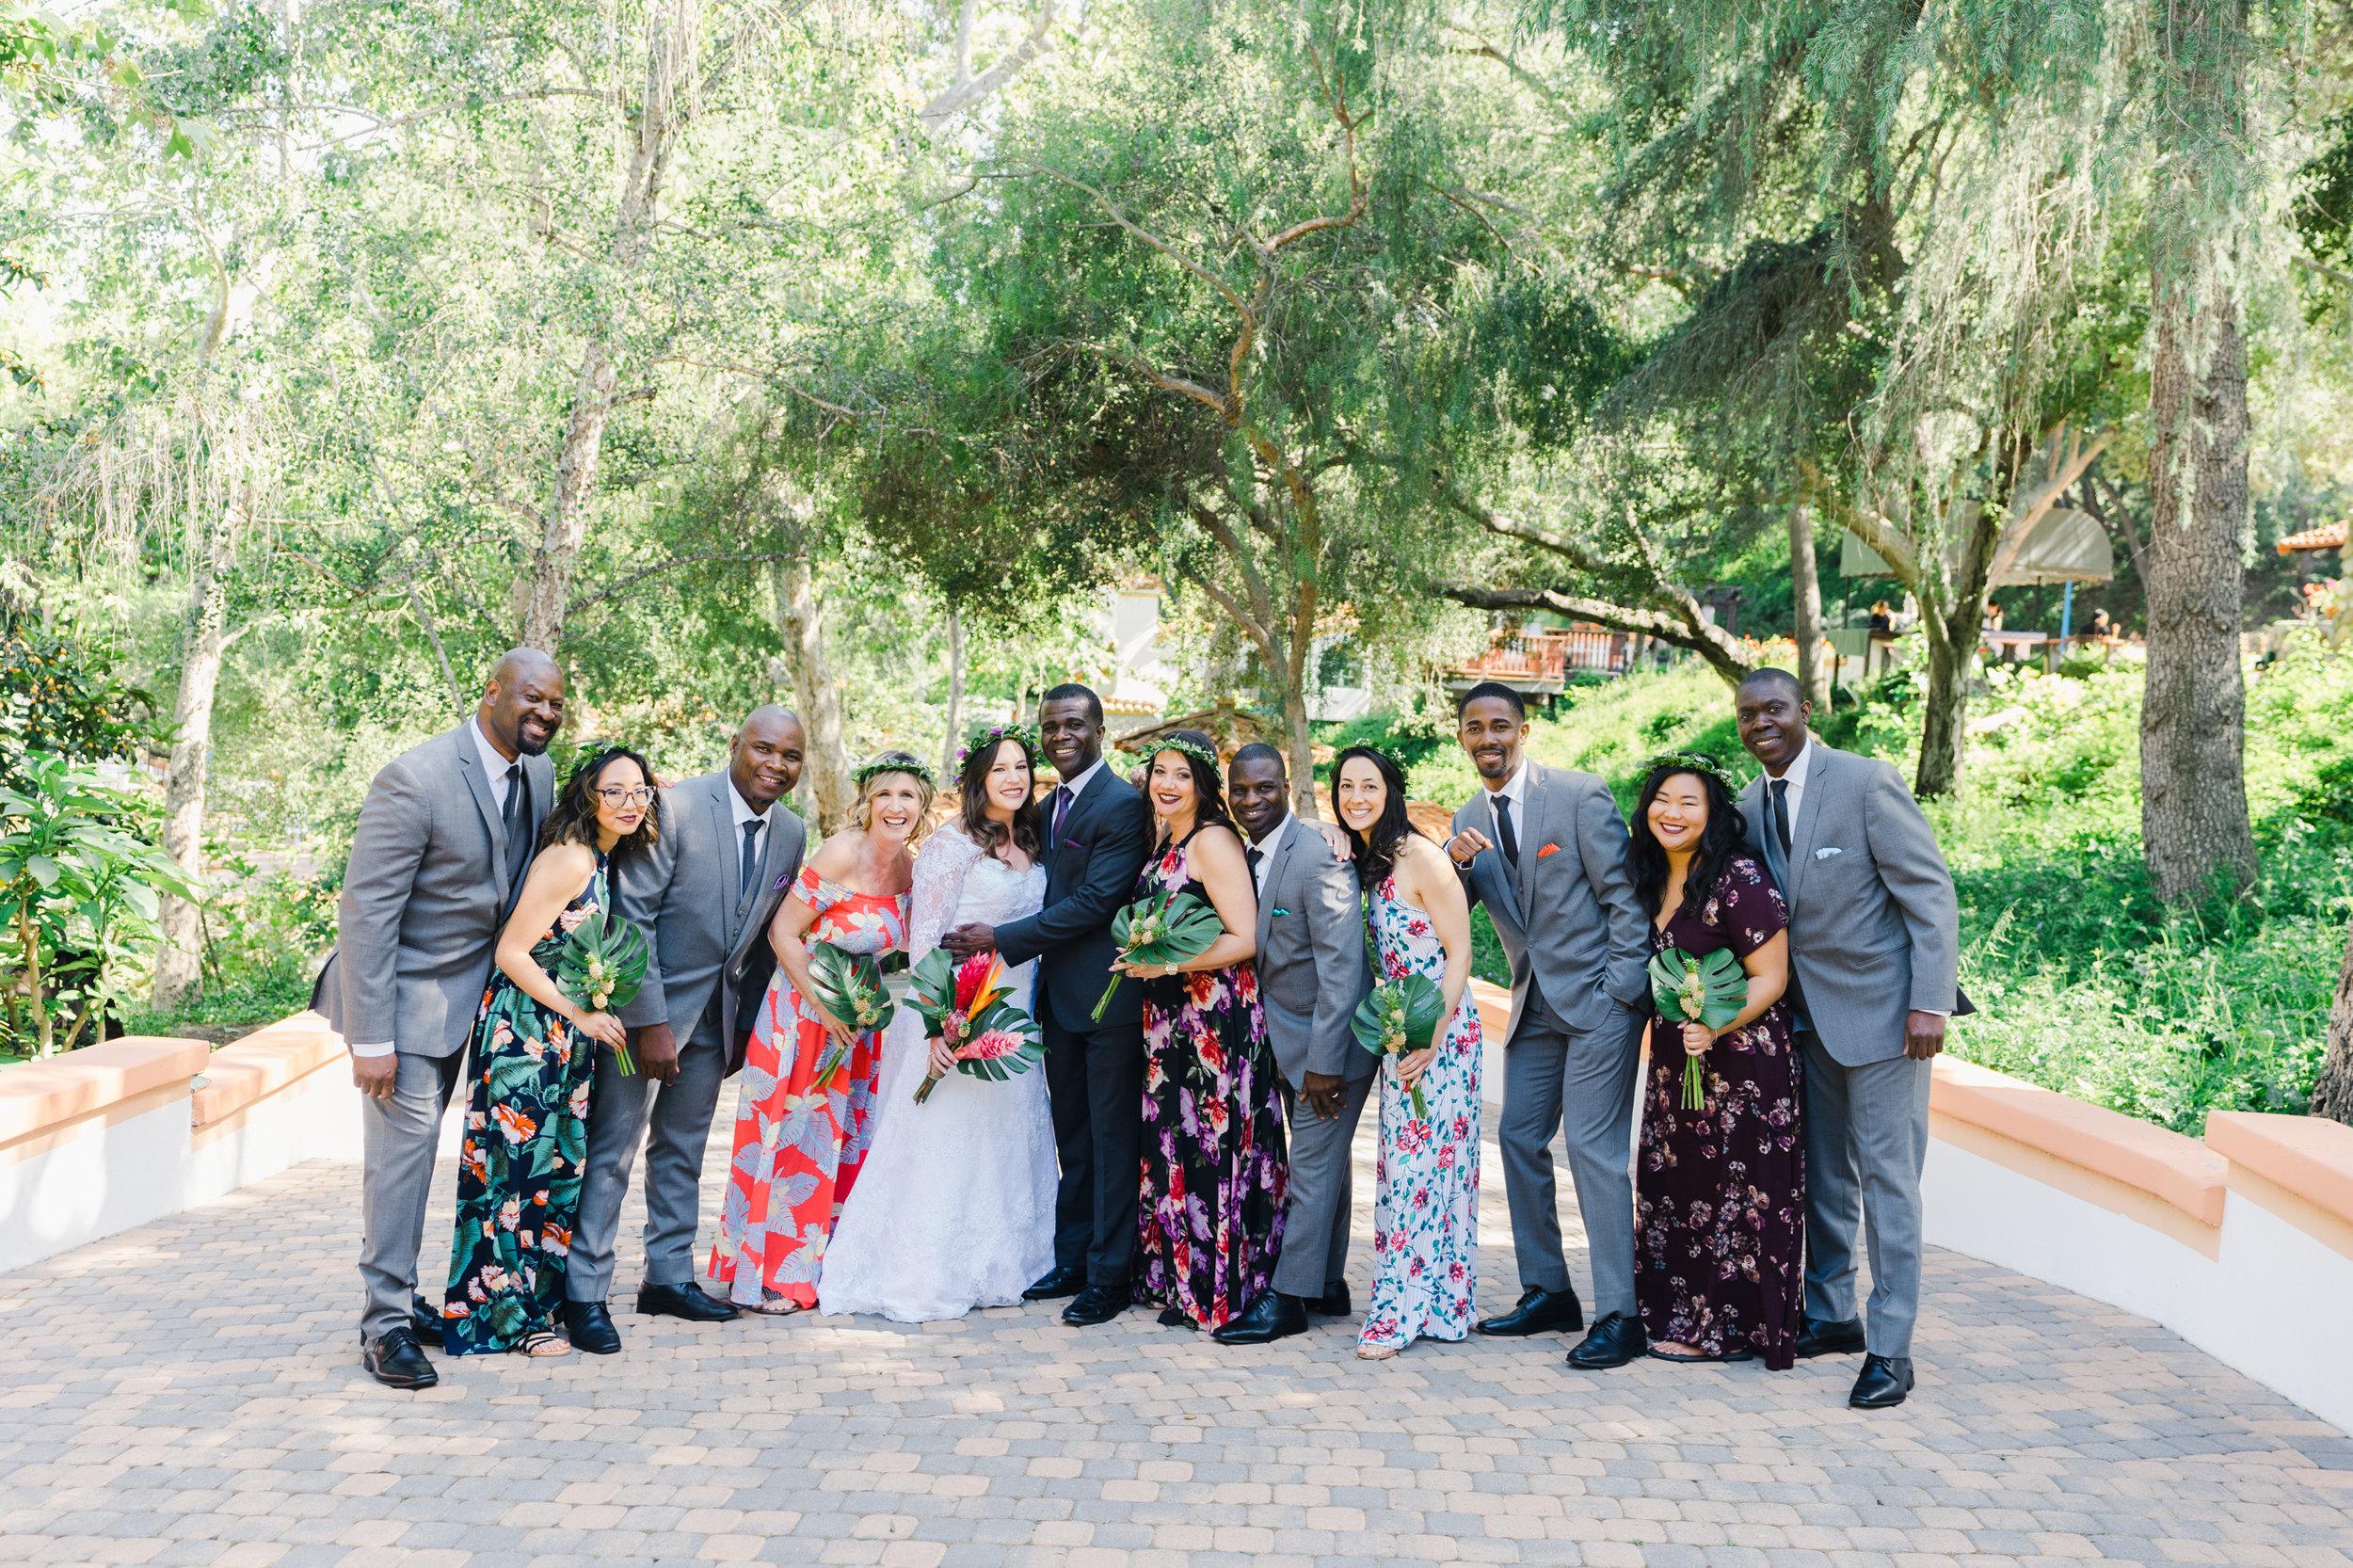 rancho-las-lomas-wedding-kelsey-sim_0083.JPG